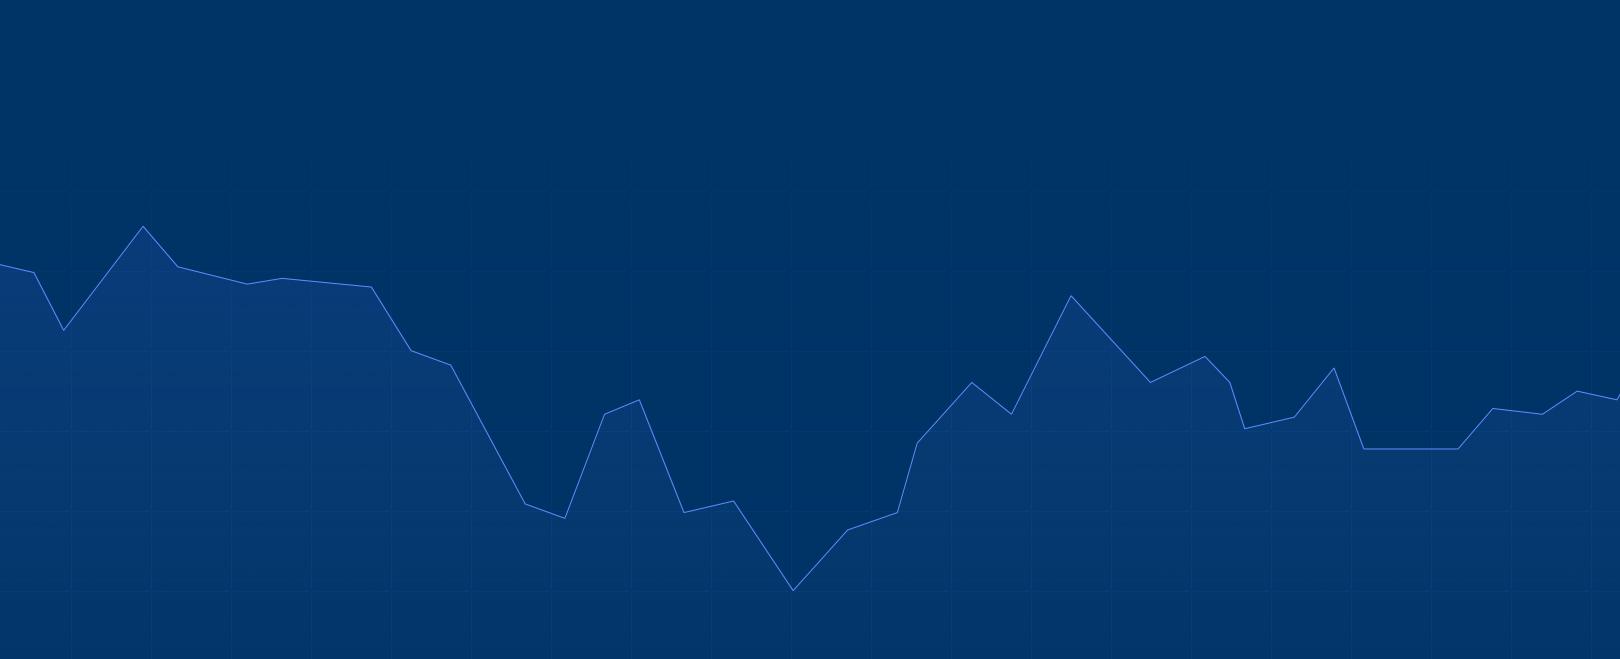 financials home graph background